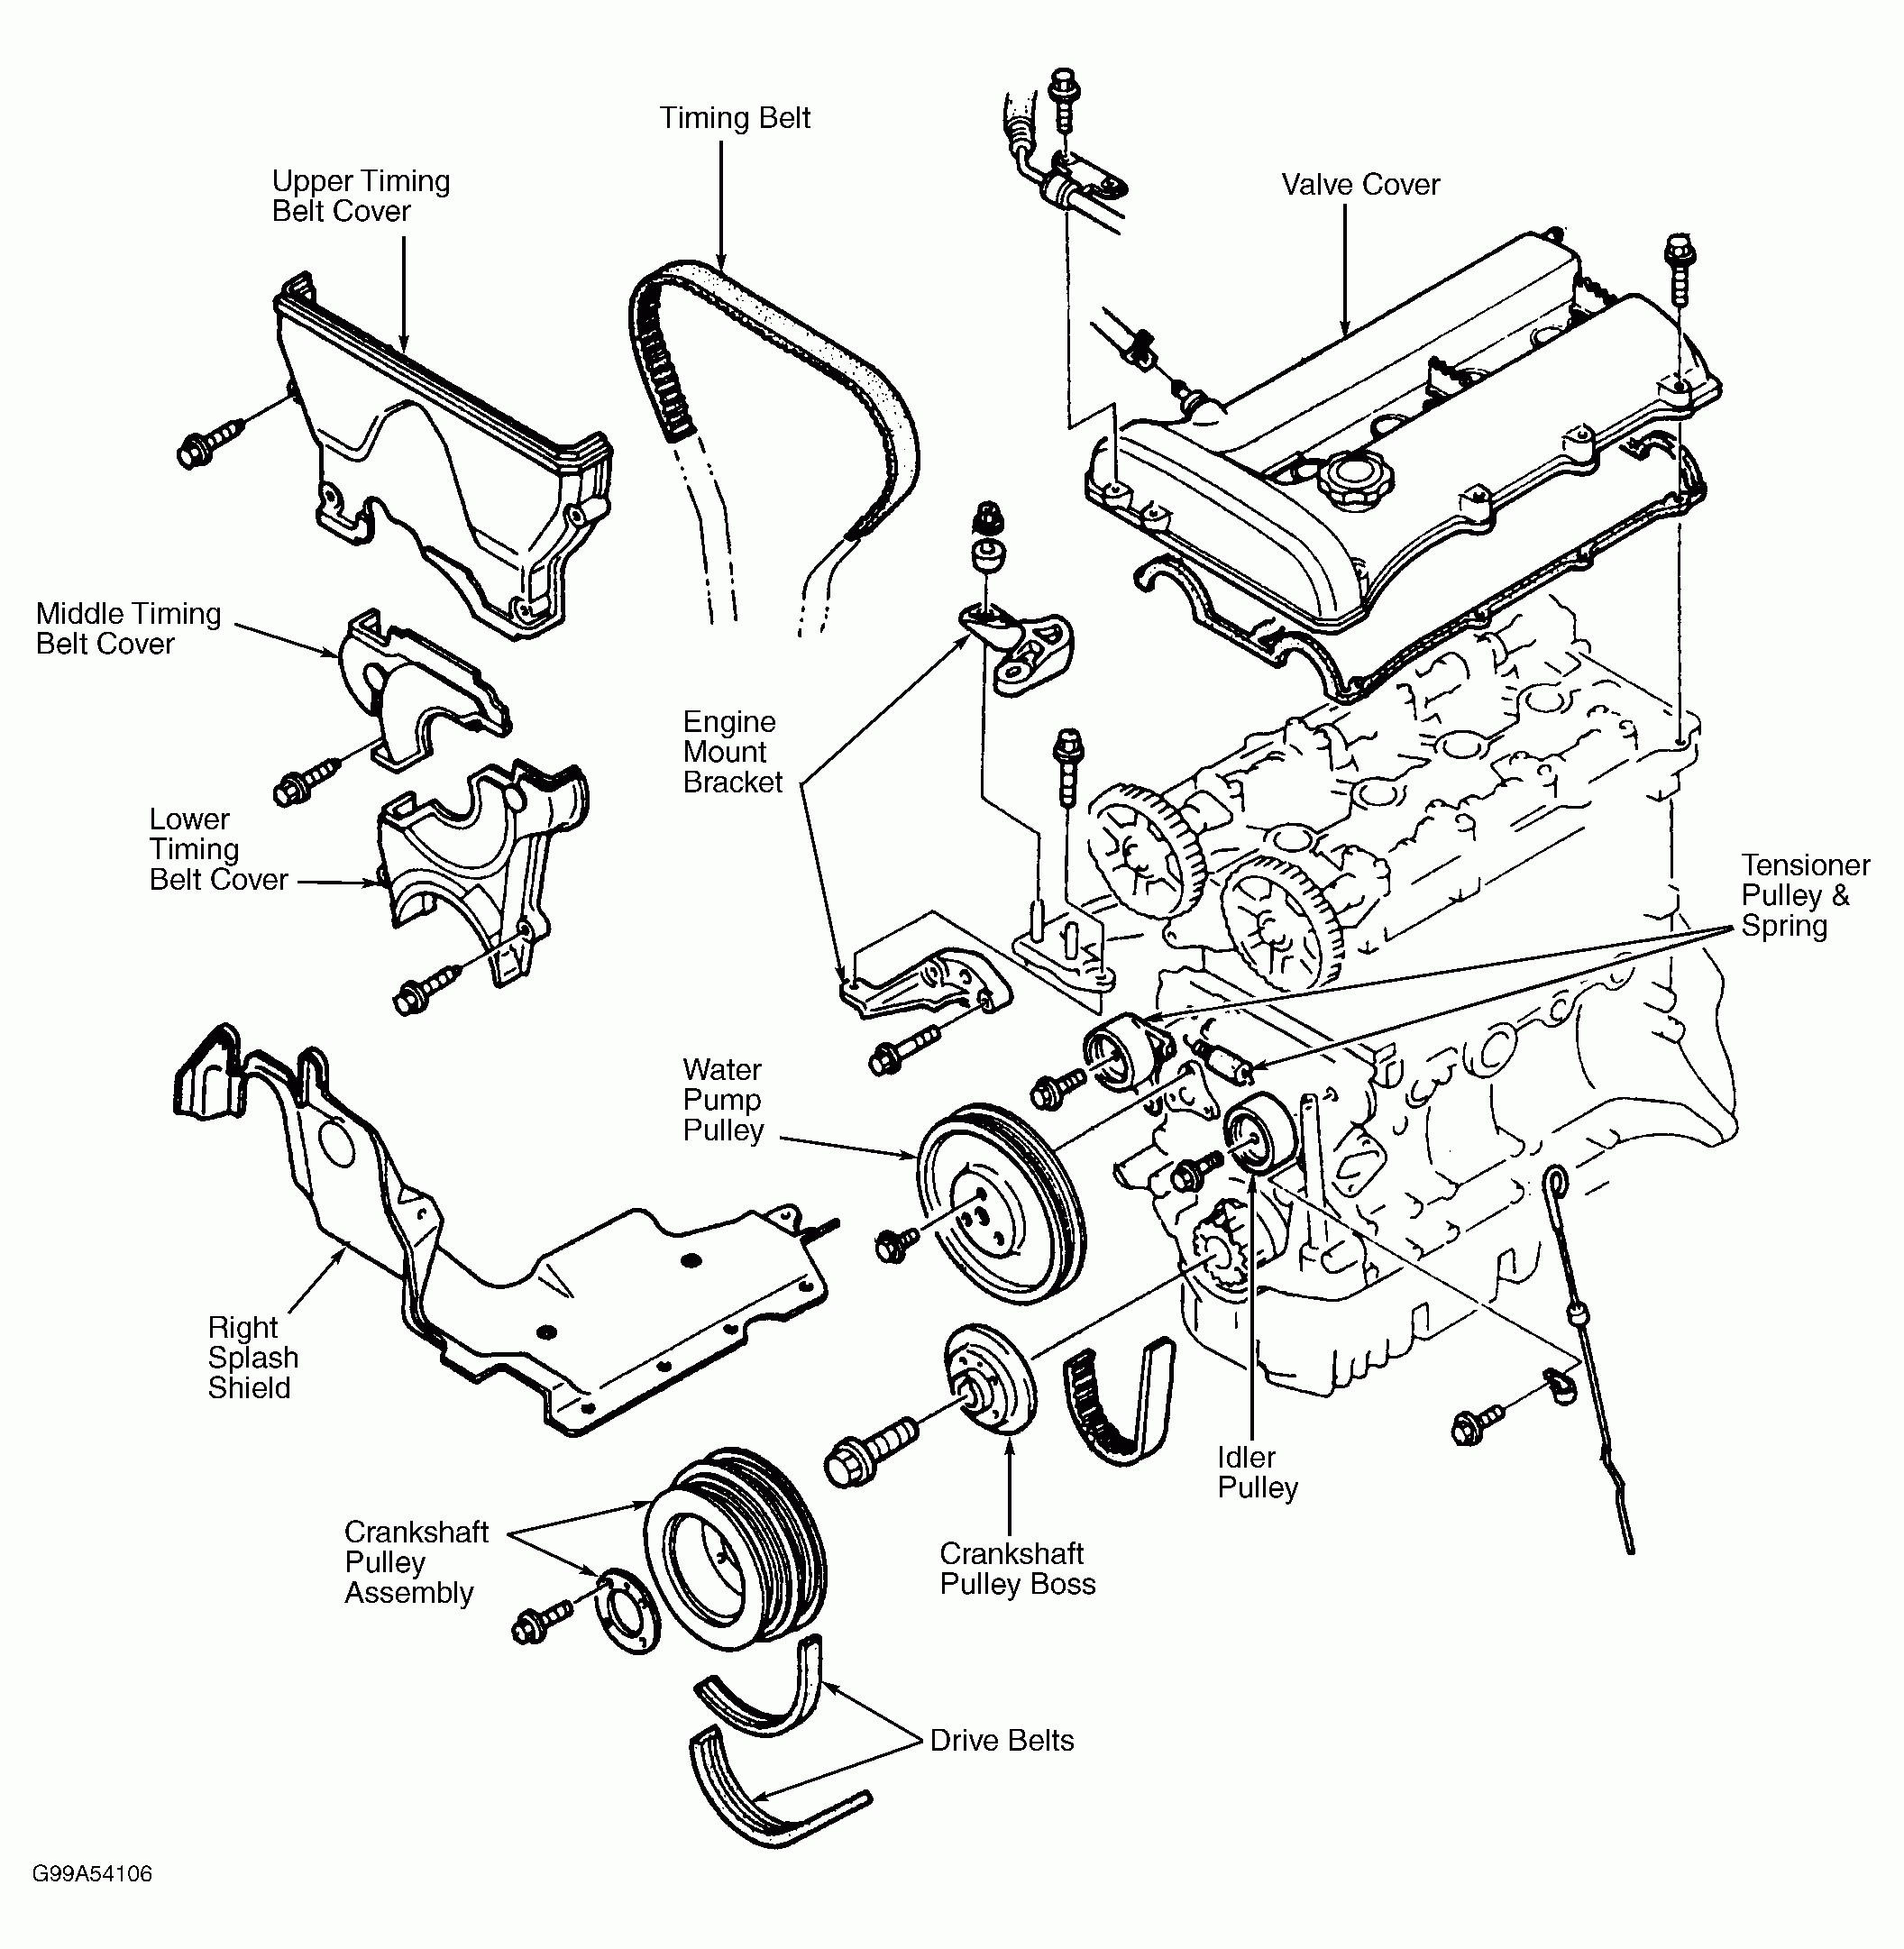 2001 Mazda Protege Engine Diagram Mazda Engine Schematics Wiring Diagram Database Of 2001 Mazda Protege Engine Diagram